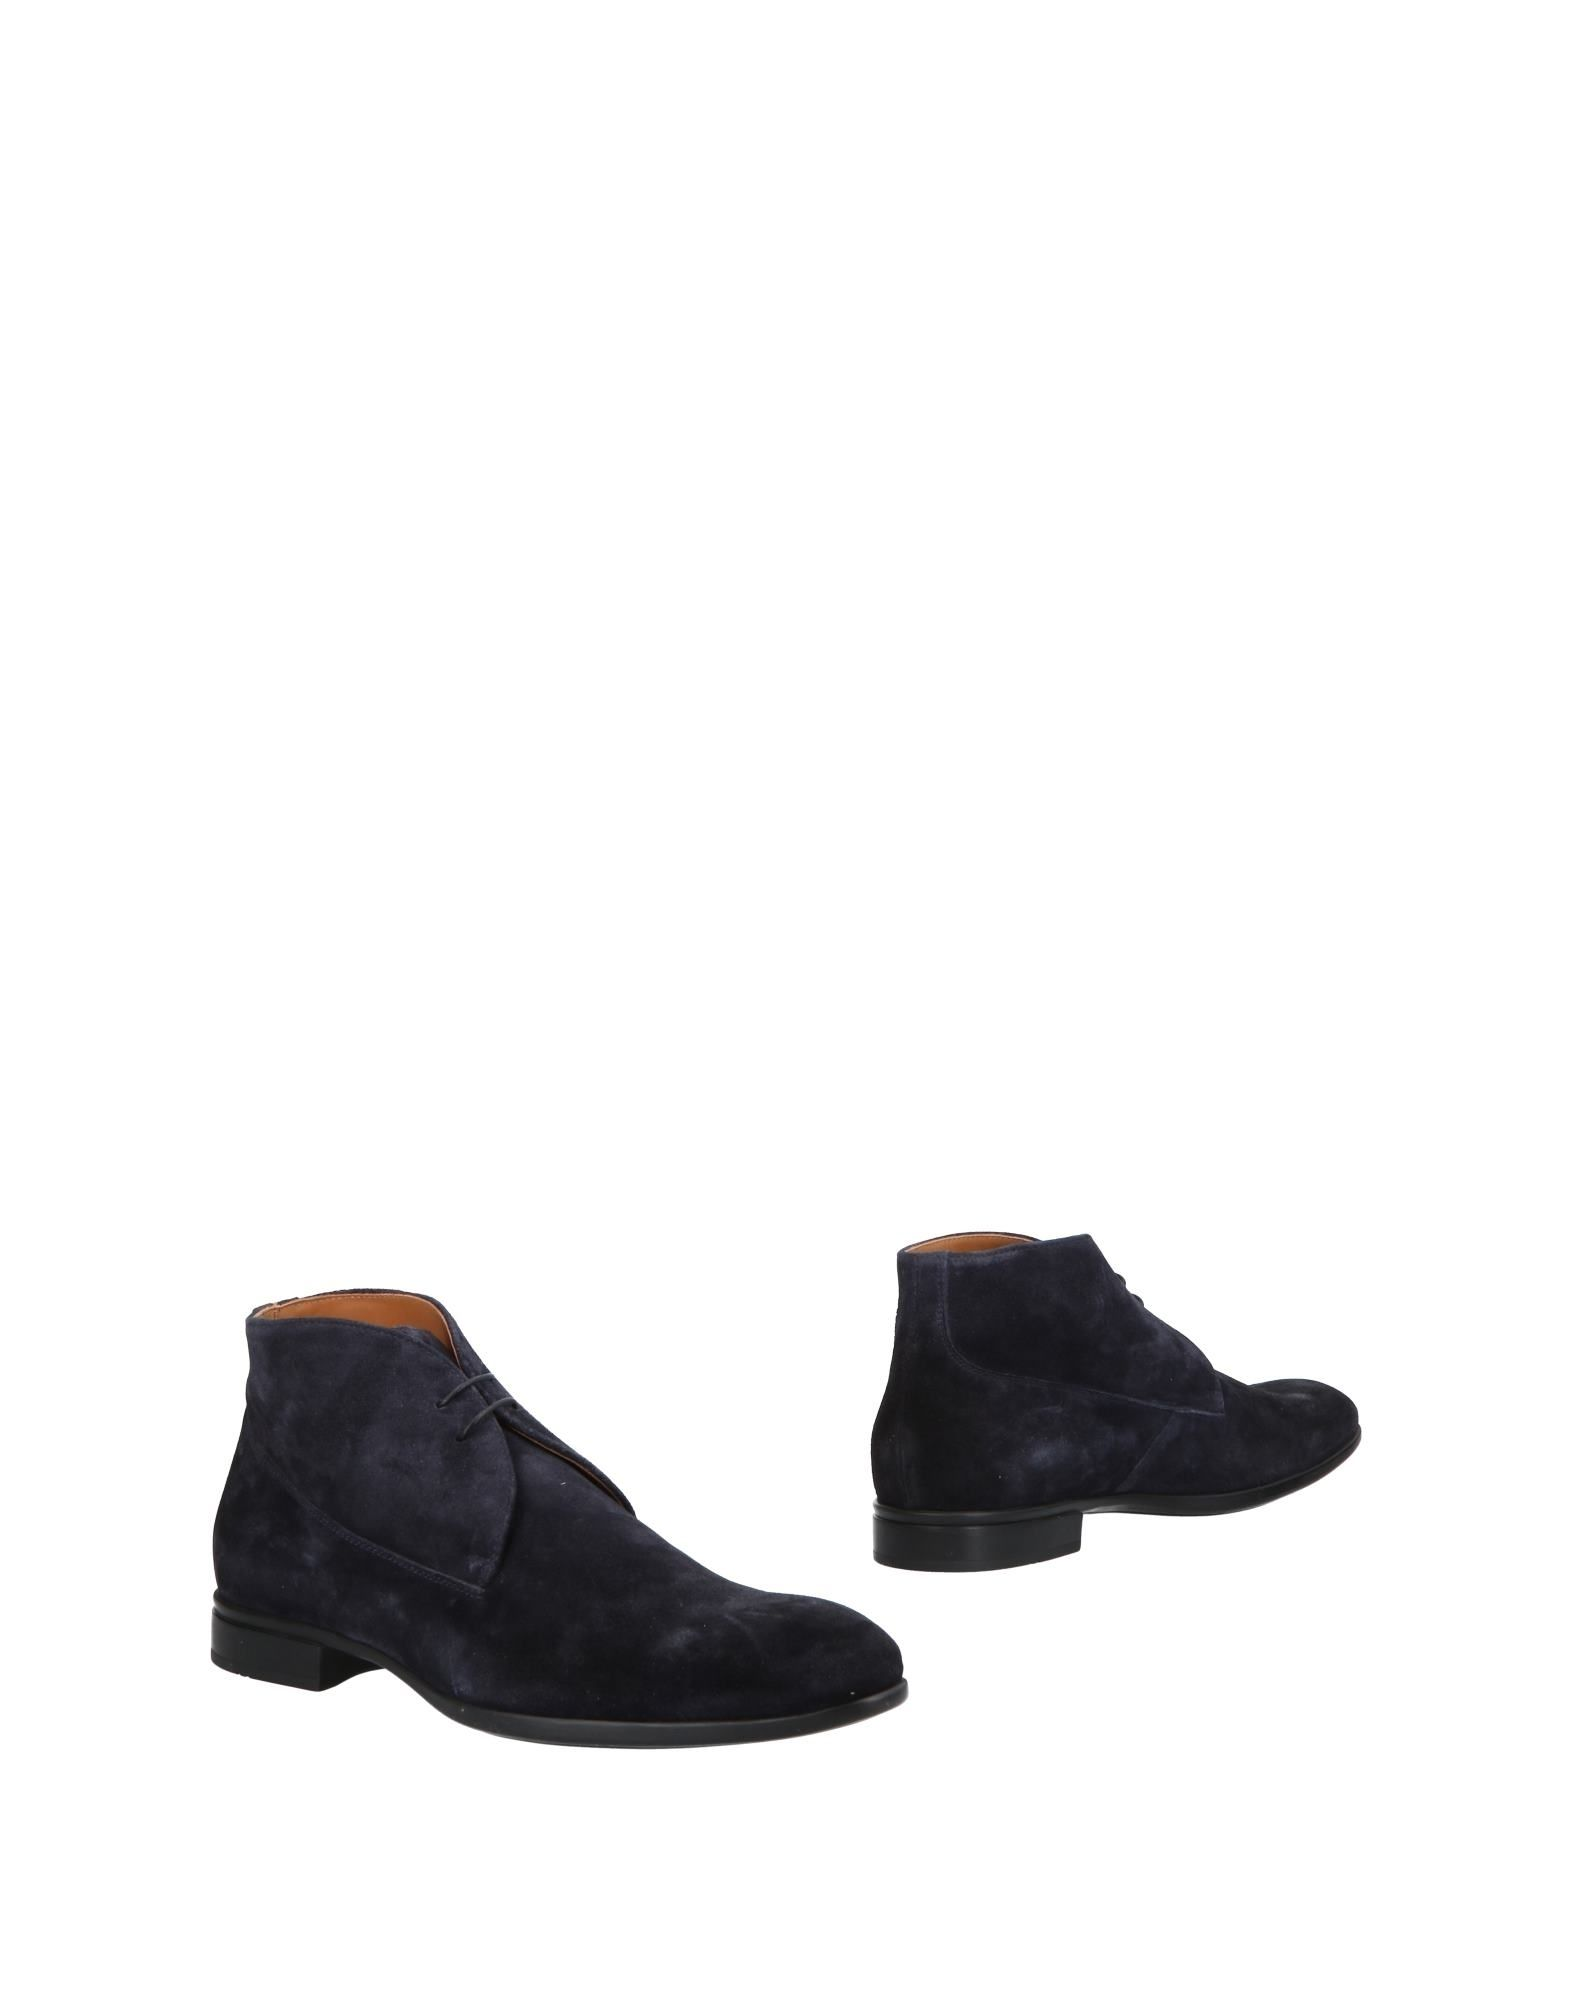 Doucal's Stiefelette Herren  11506107TK Schuhe Gute Qualität beliebte Schuhe 11506107TK 28b560